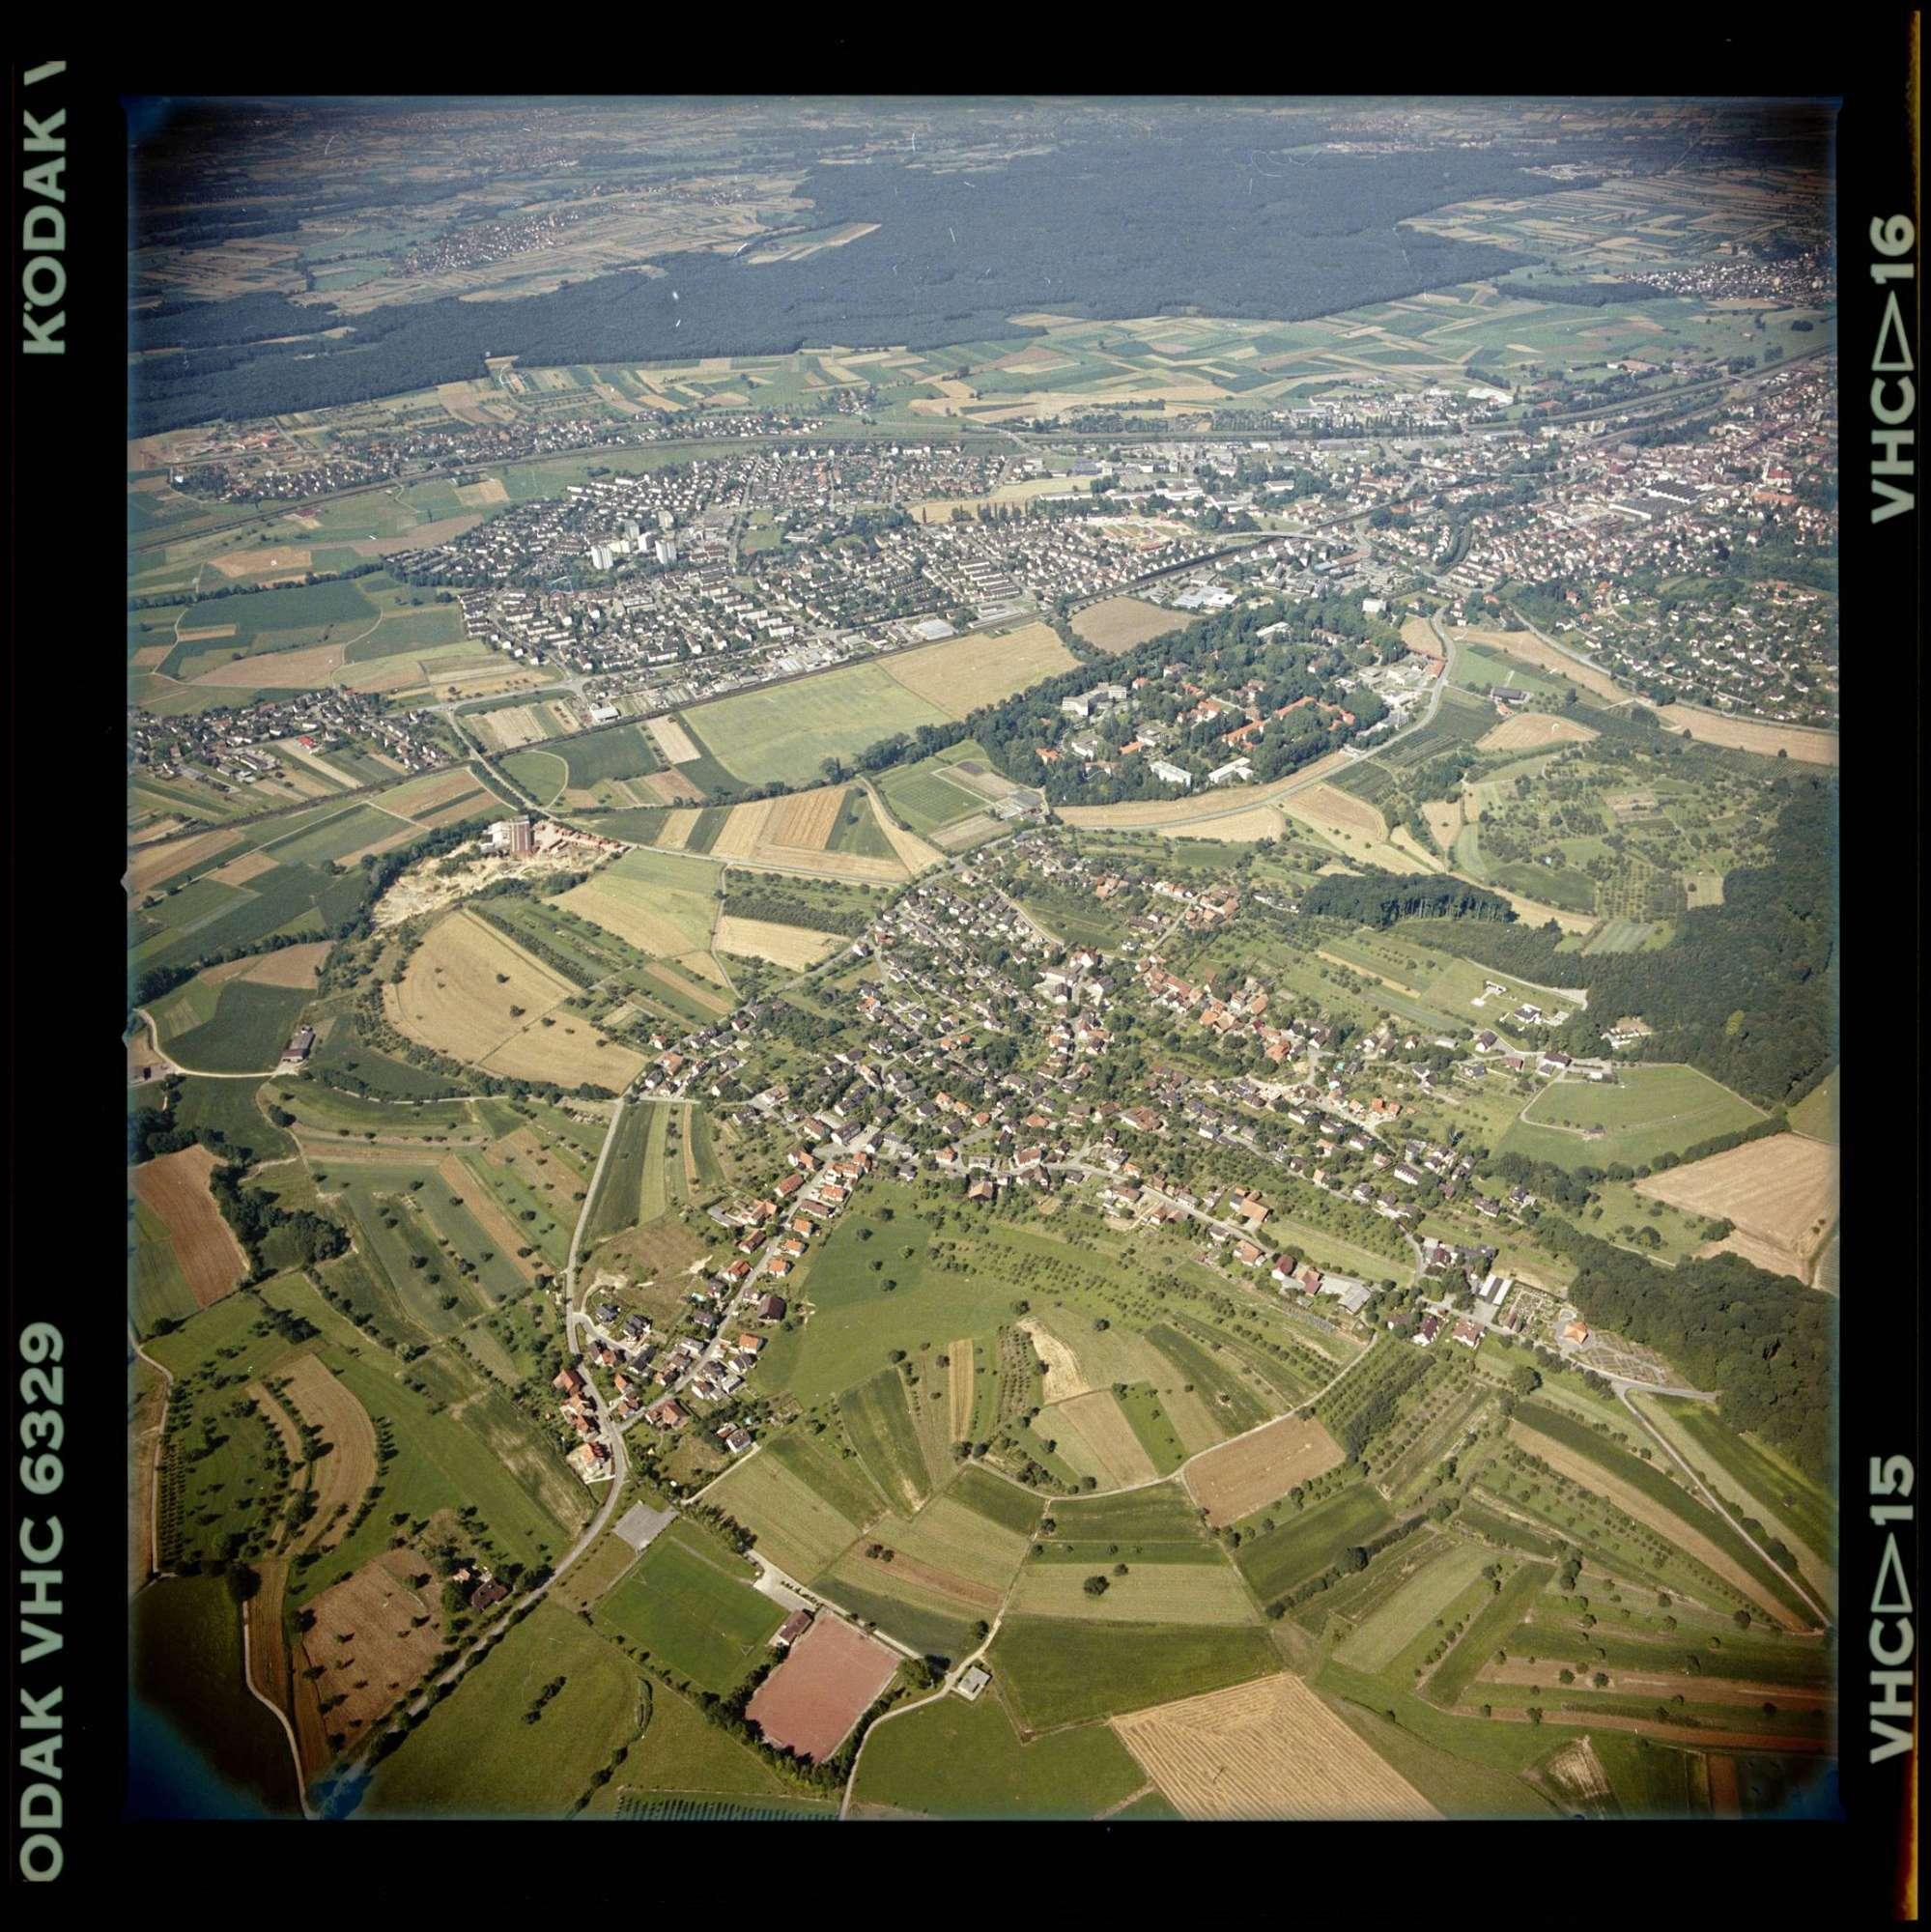 Windenreute, Luftbild, Bild 1